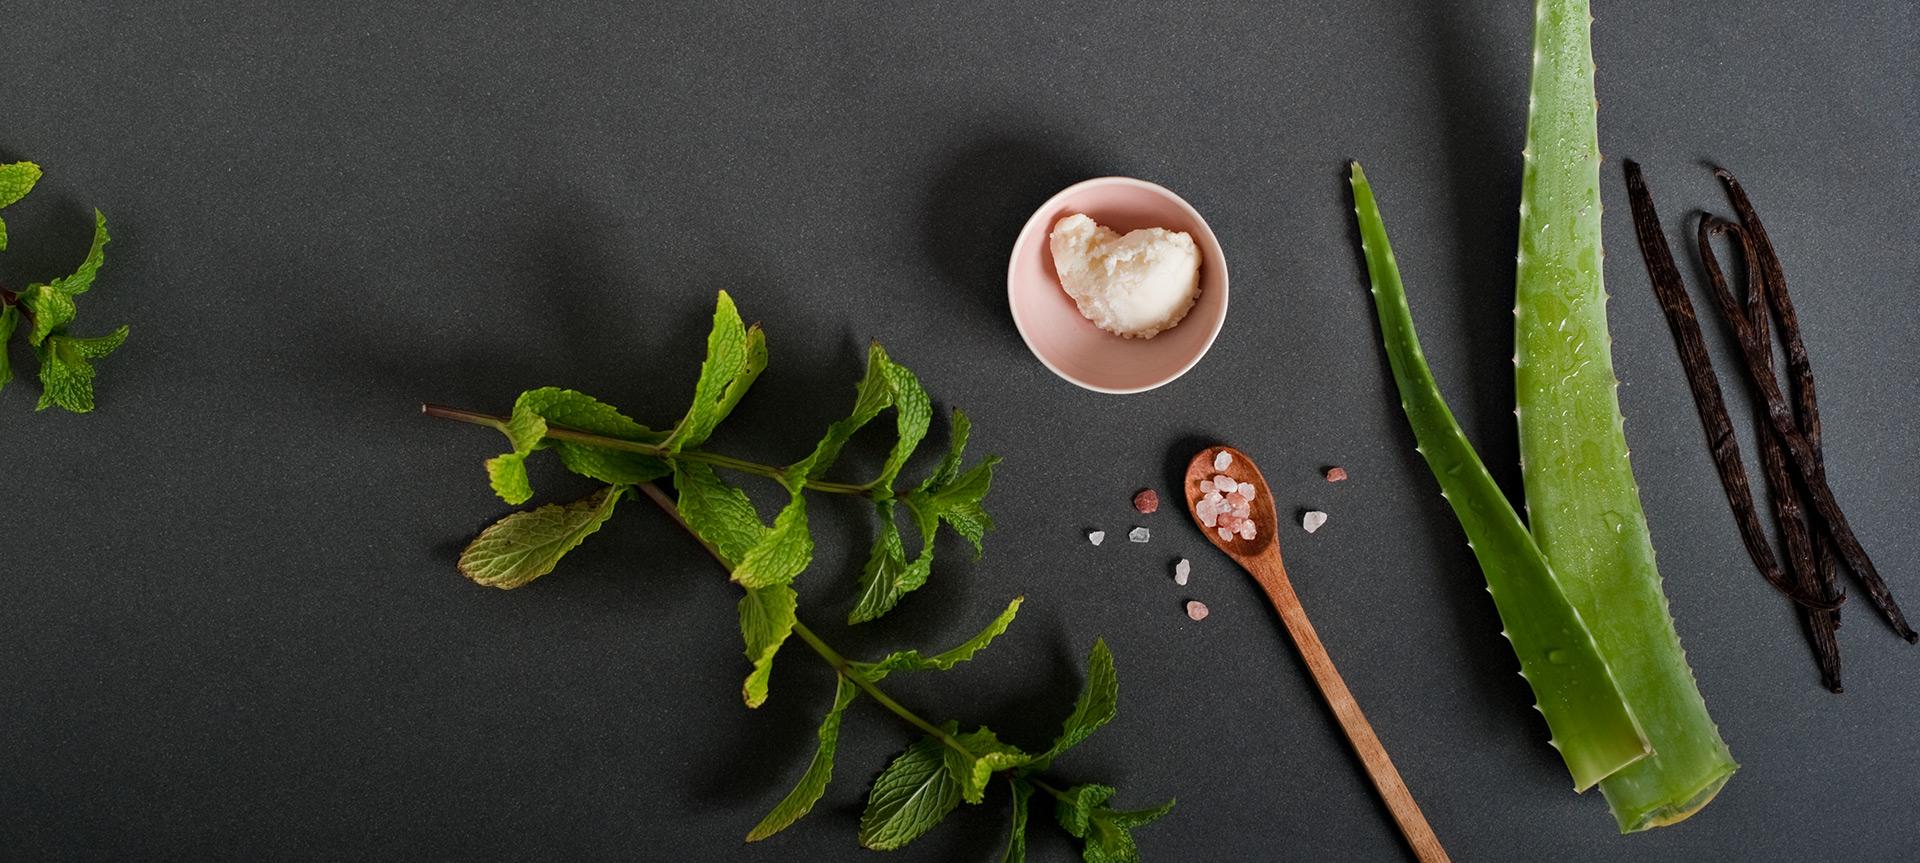 Eucalyptus Mint Benefits Panel Background